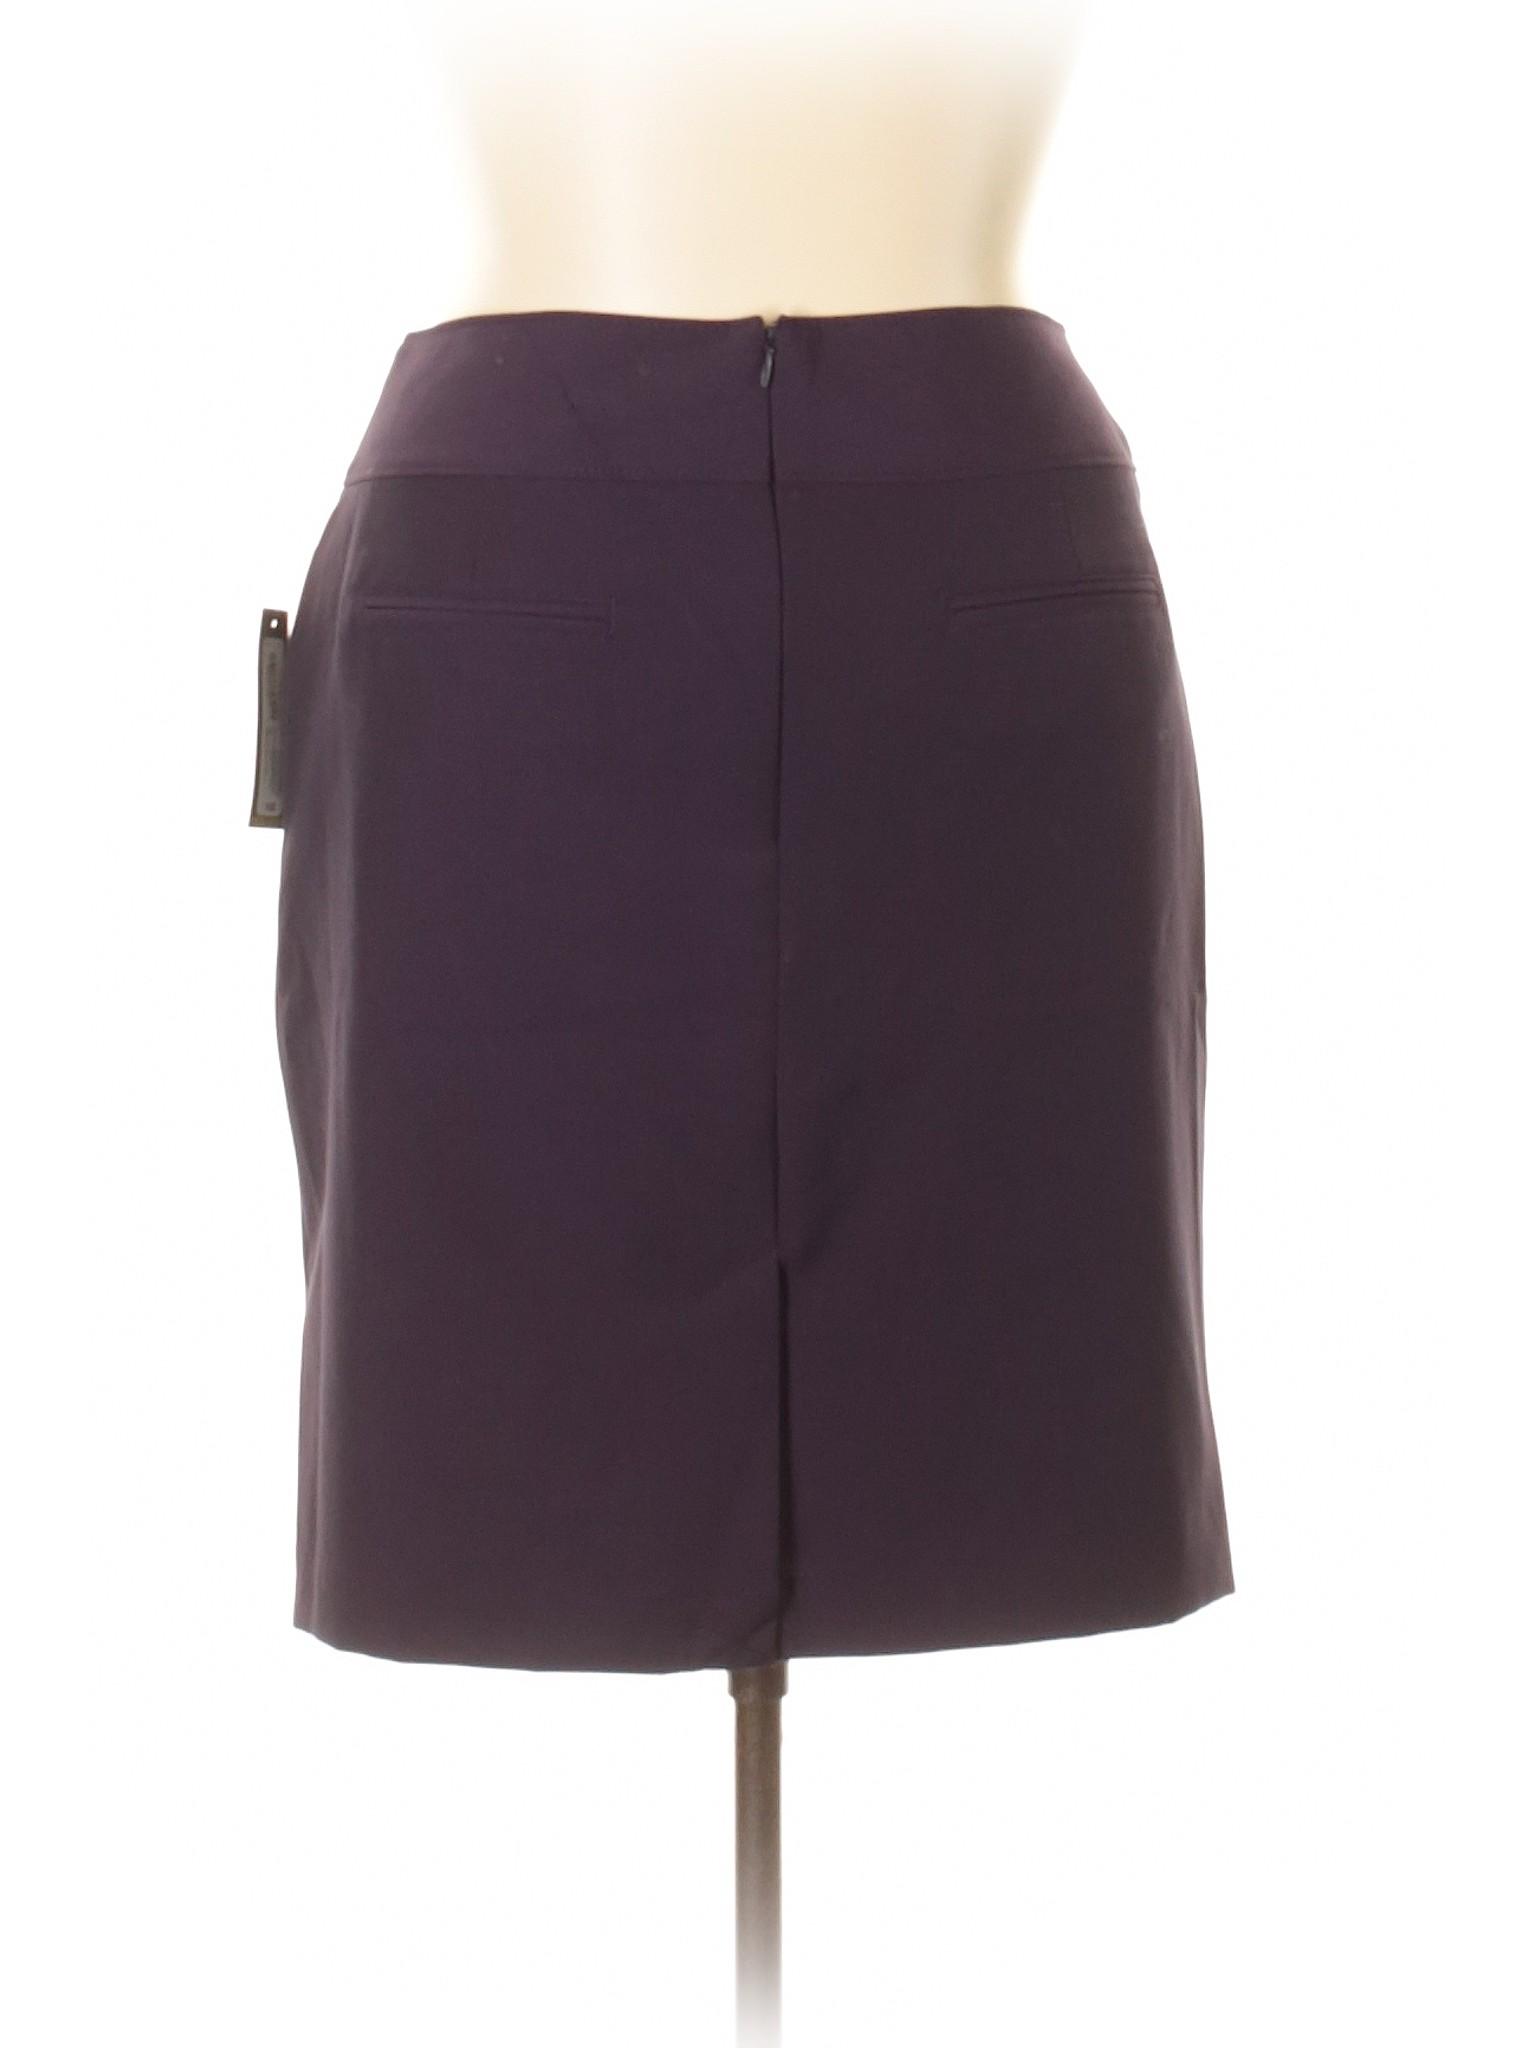 Boutique leisure Casual leisure Worthington Boutique Skirt Worthington rf4CrqBv